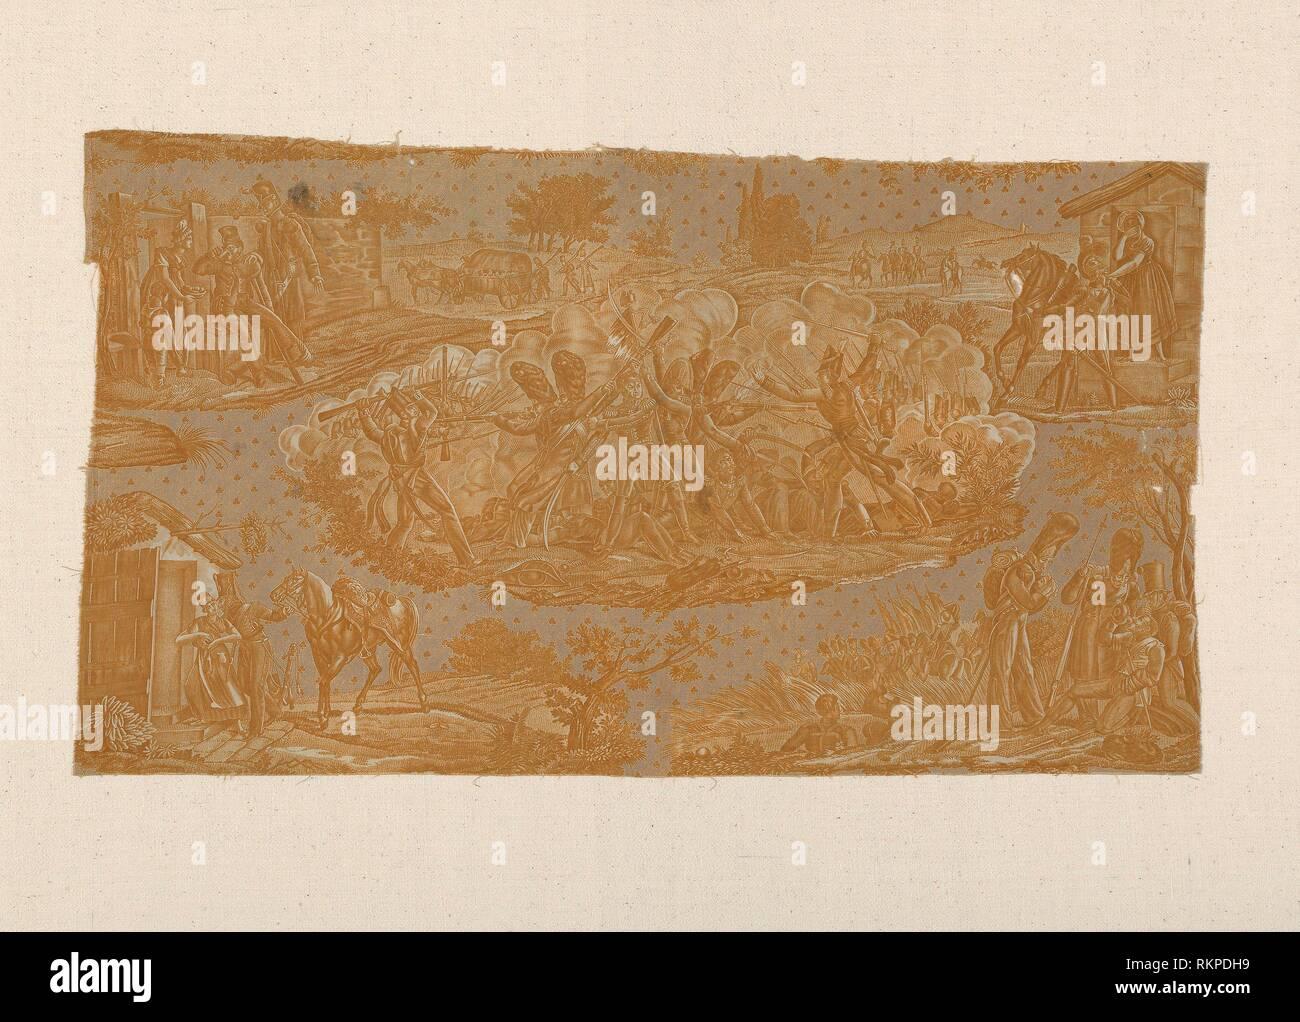 Cambronne at Waterloo (Furnishing Fabric) - 1820/25 - Manufactured by Hartmann et Fils France, Alsace, Munster - Artist: Hartmann et Fils, Origin: - Stock Image